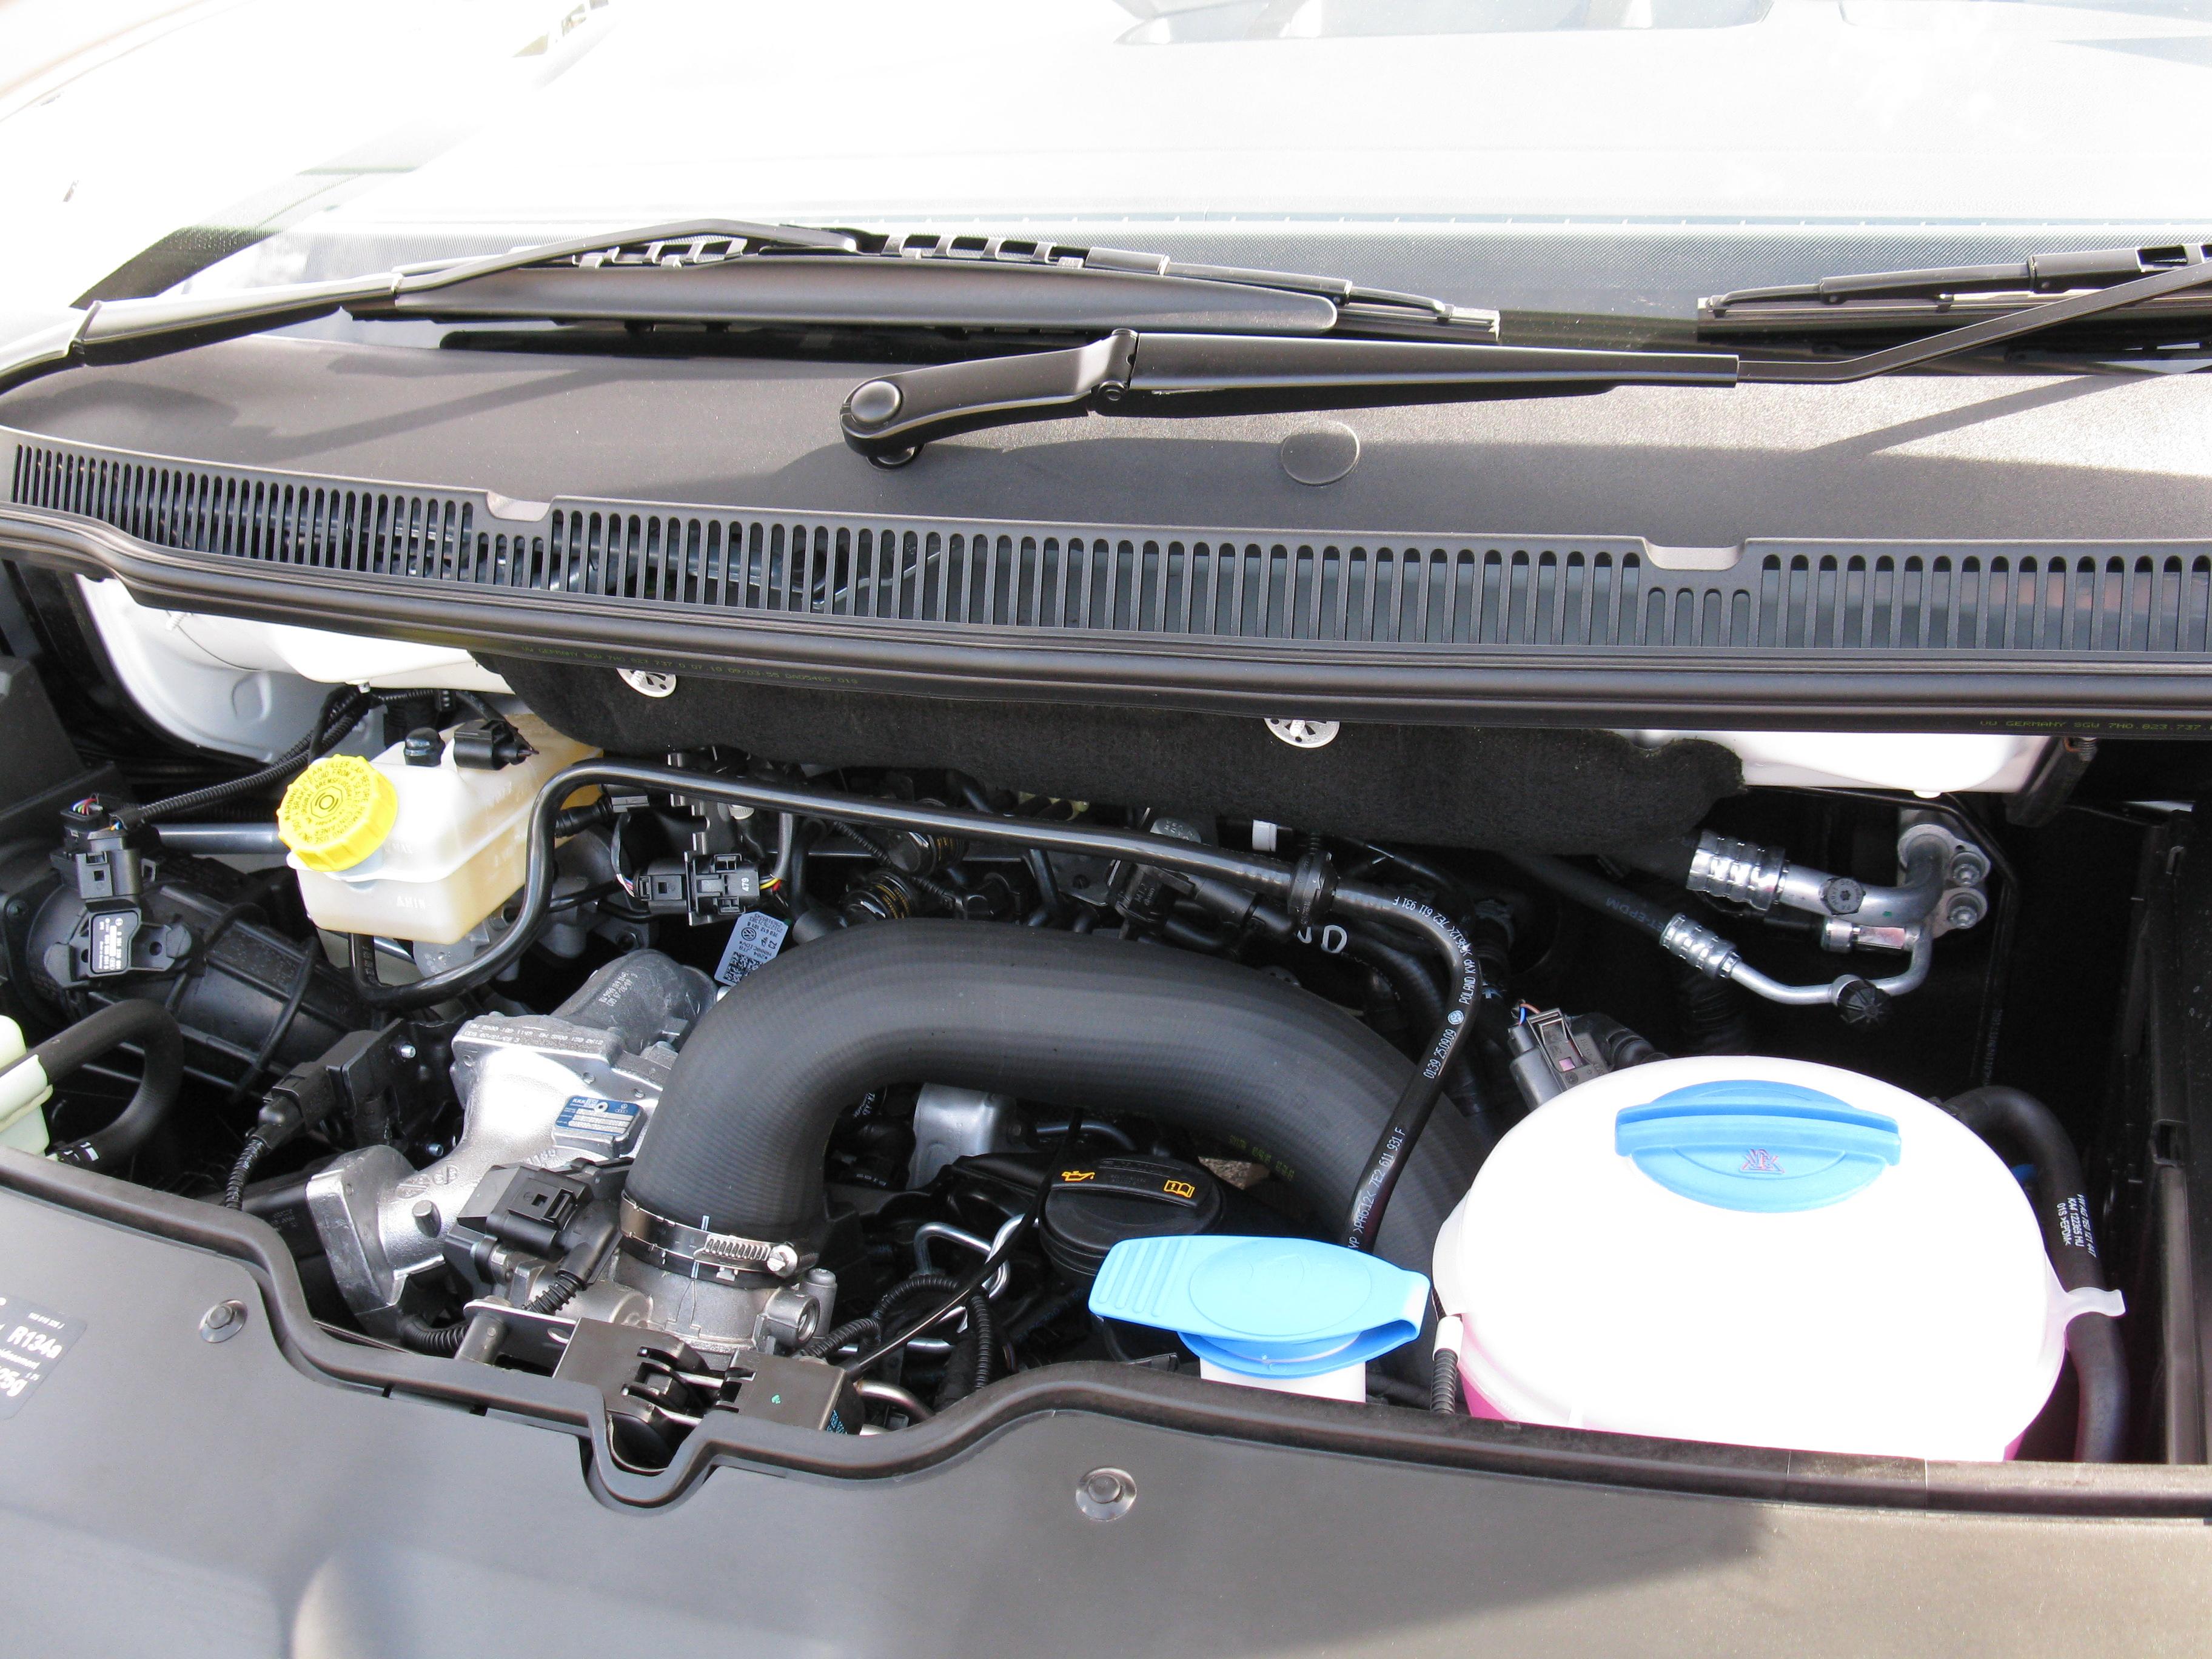 File:Volkswagen Engine 2.0 BiTDI.jpg - Wikimedia Commons